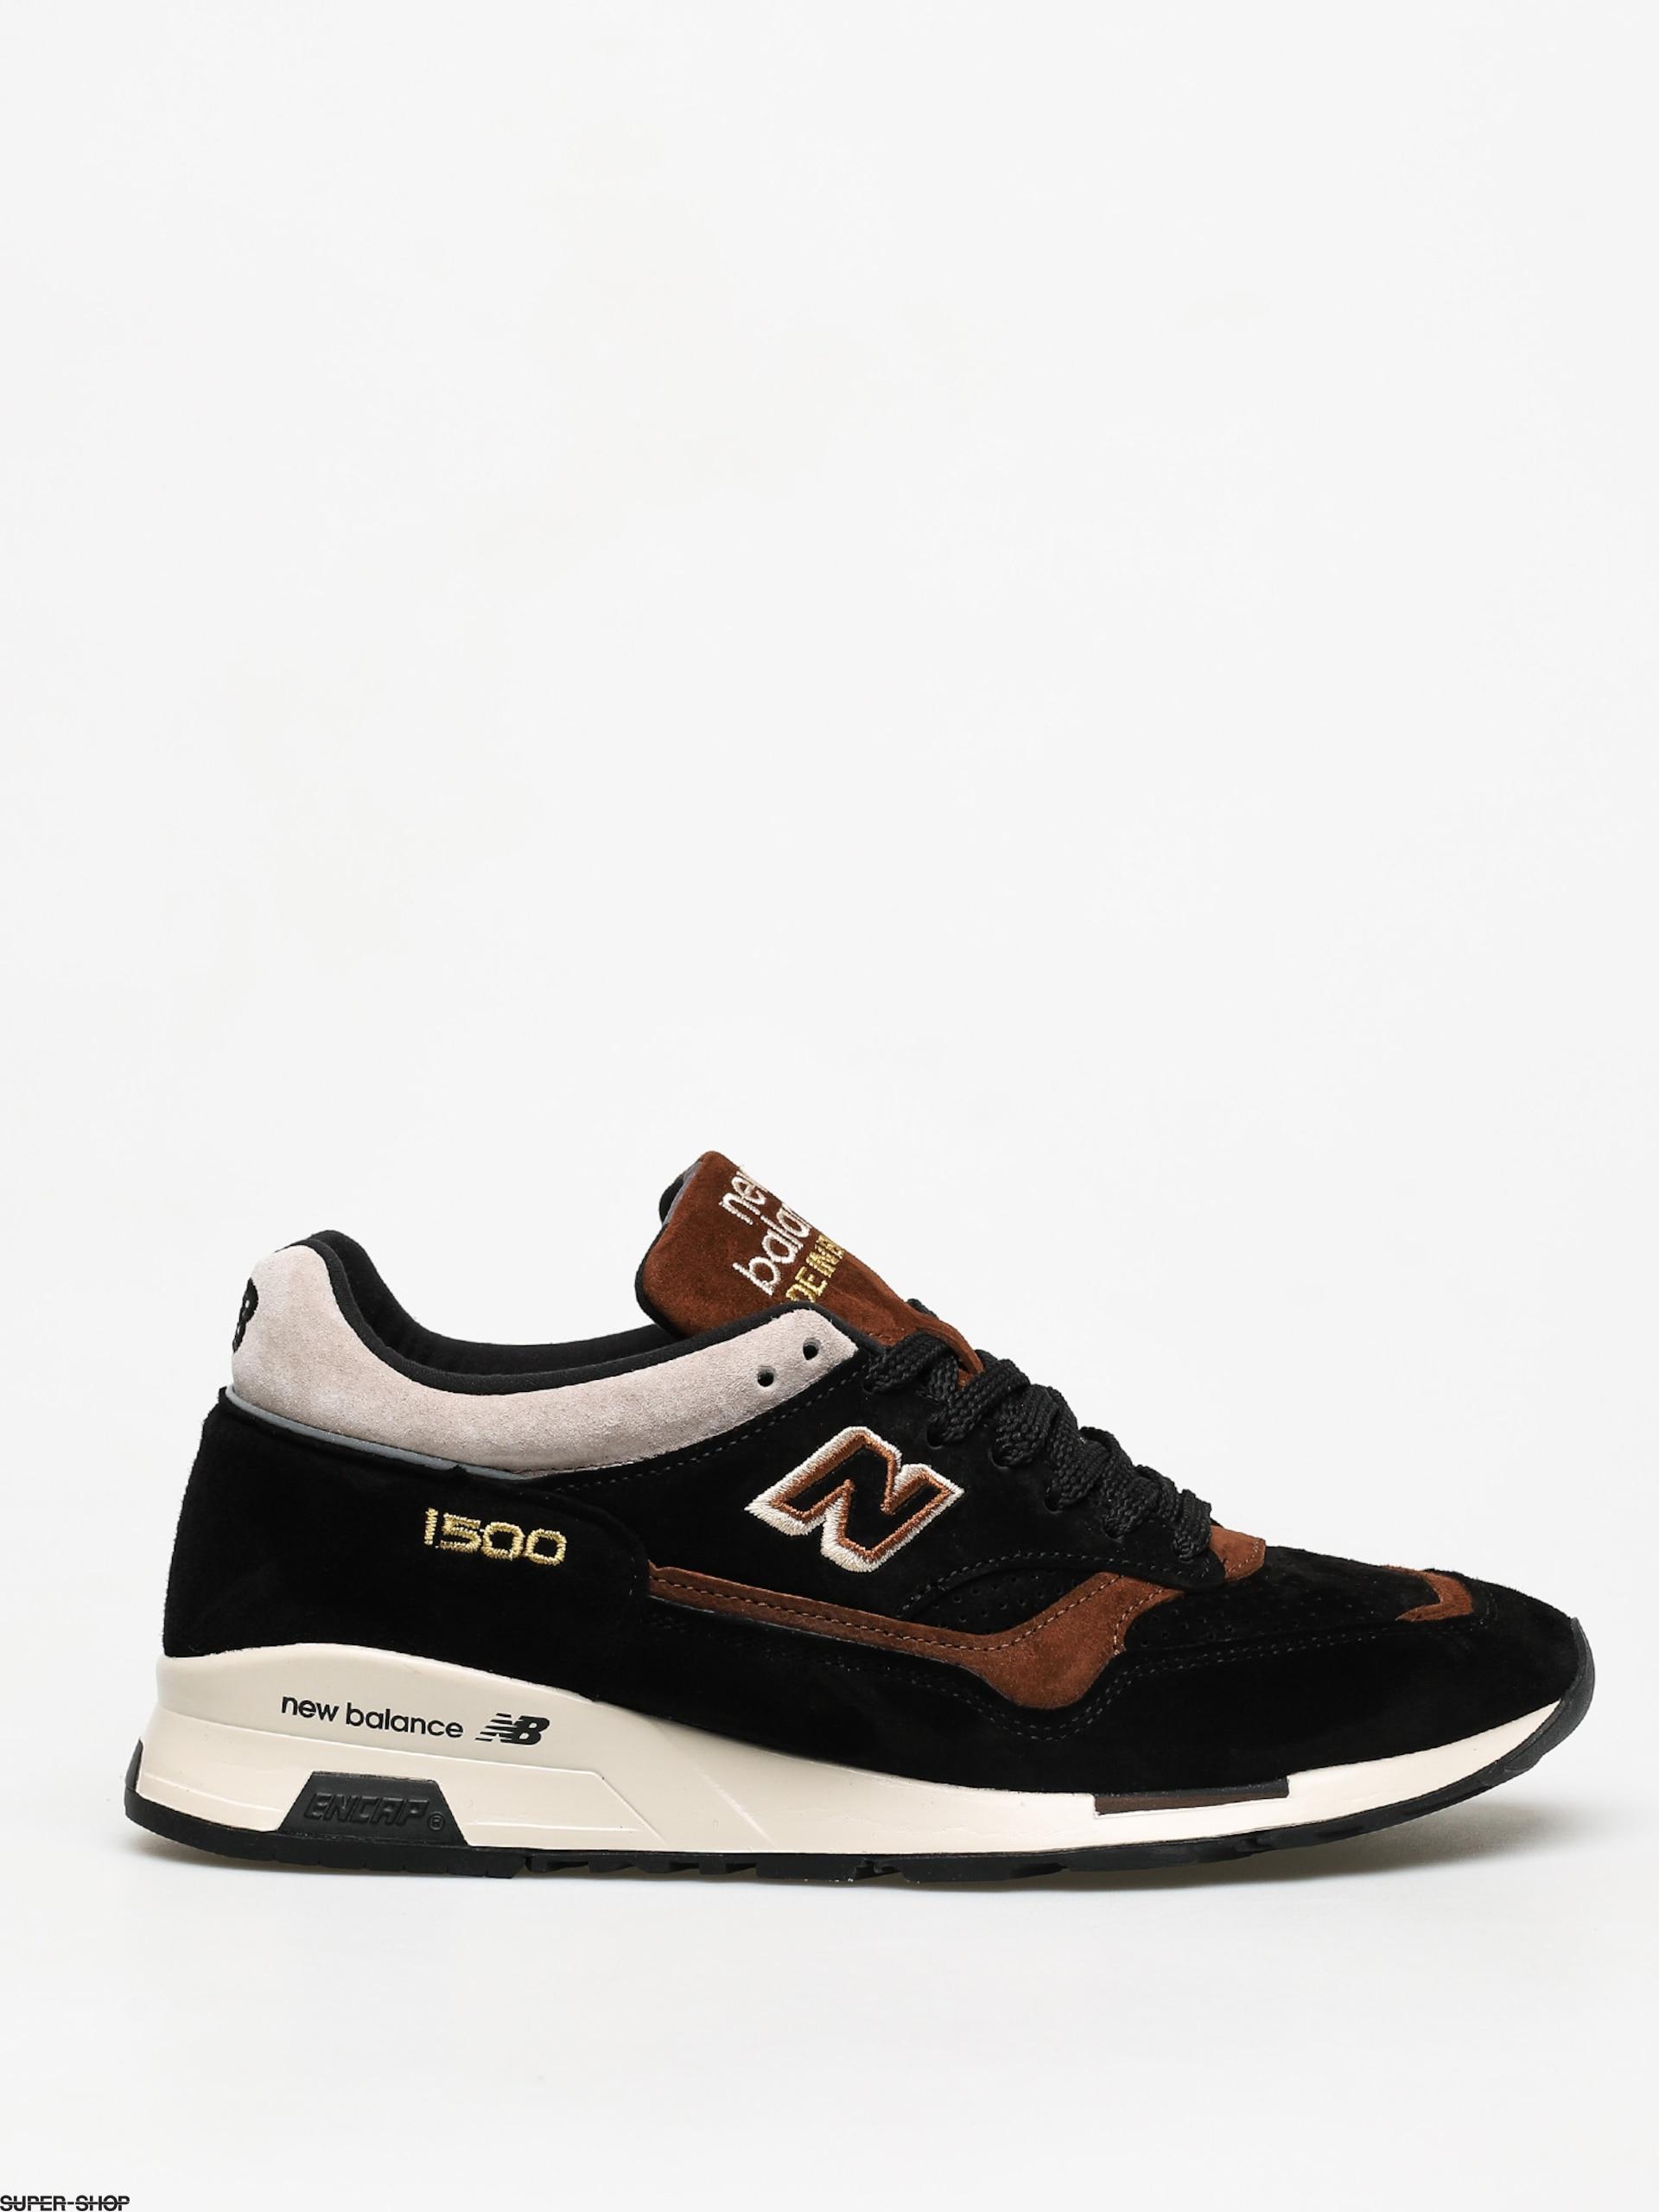 New Balance 1500 Shoes (black)